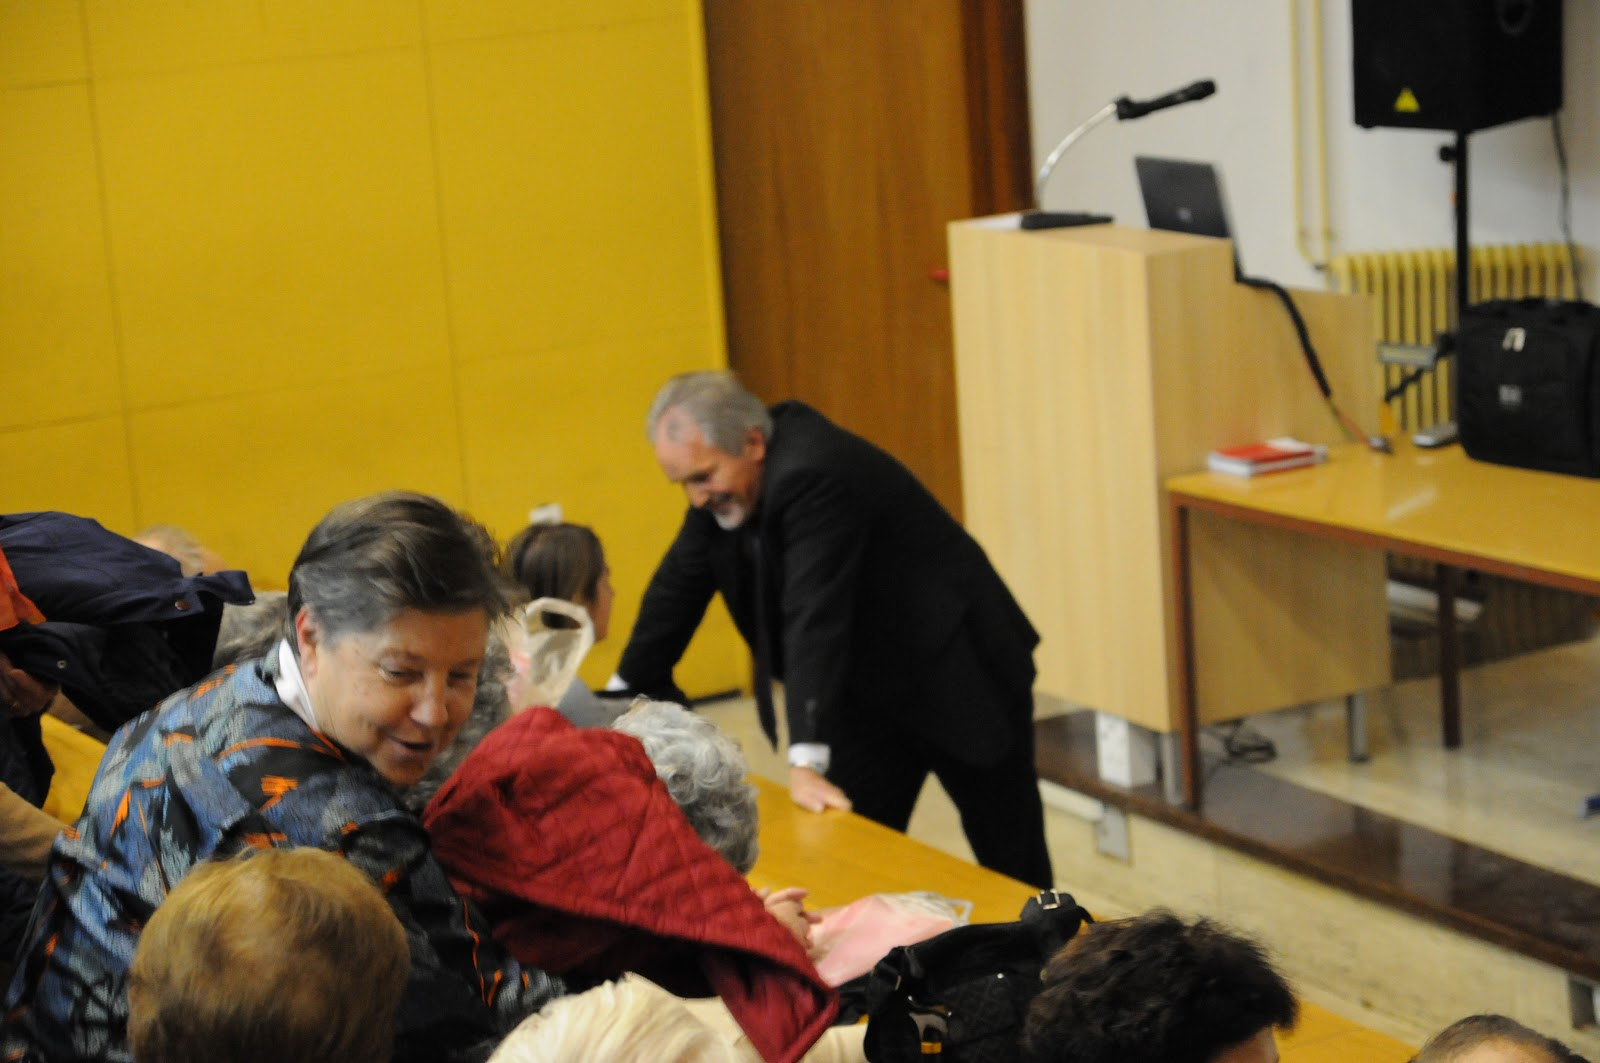 Predavanje, dr. Camlek - oktober 2011 - DSC_3856.JPG